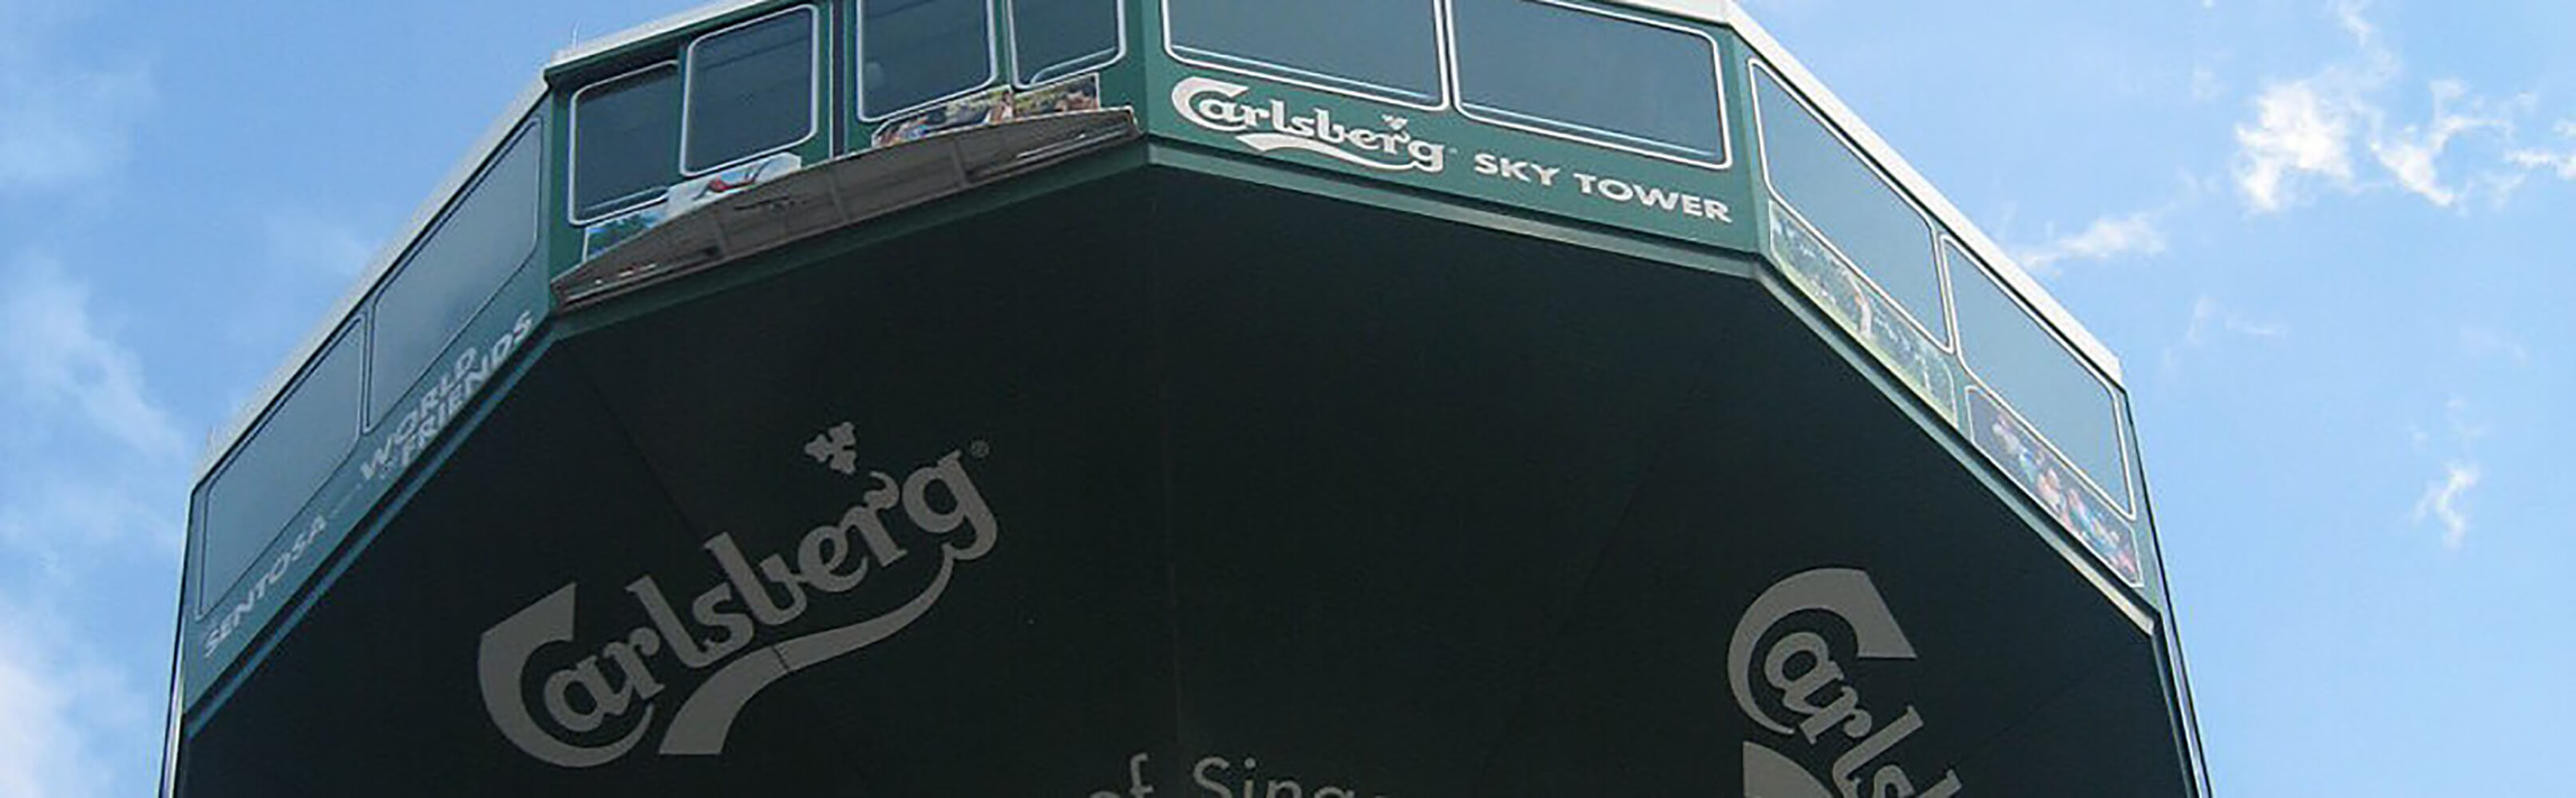 Tiger Sky Tower 1